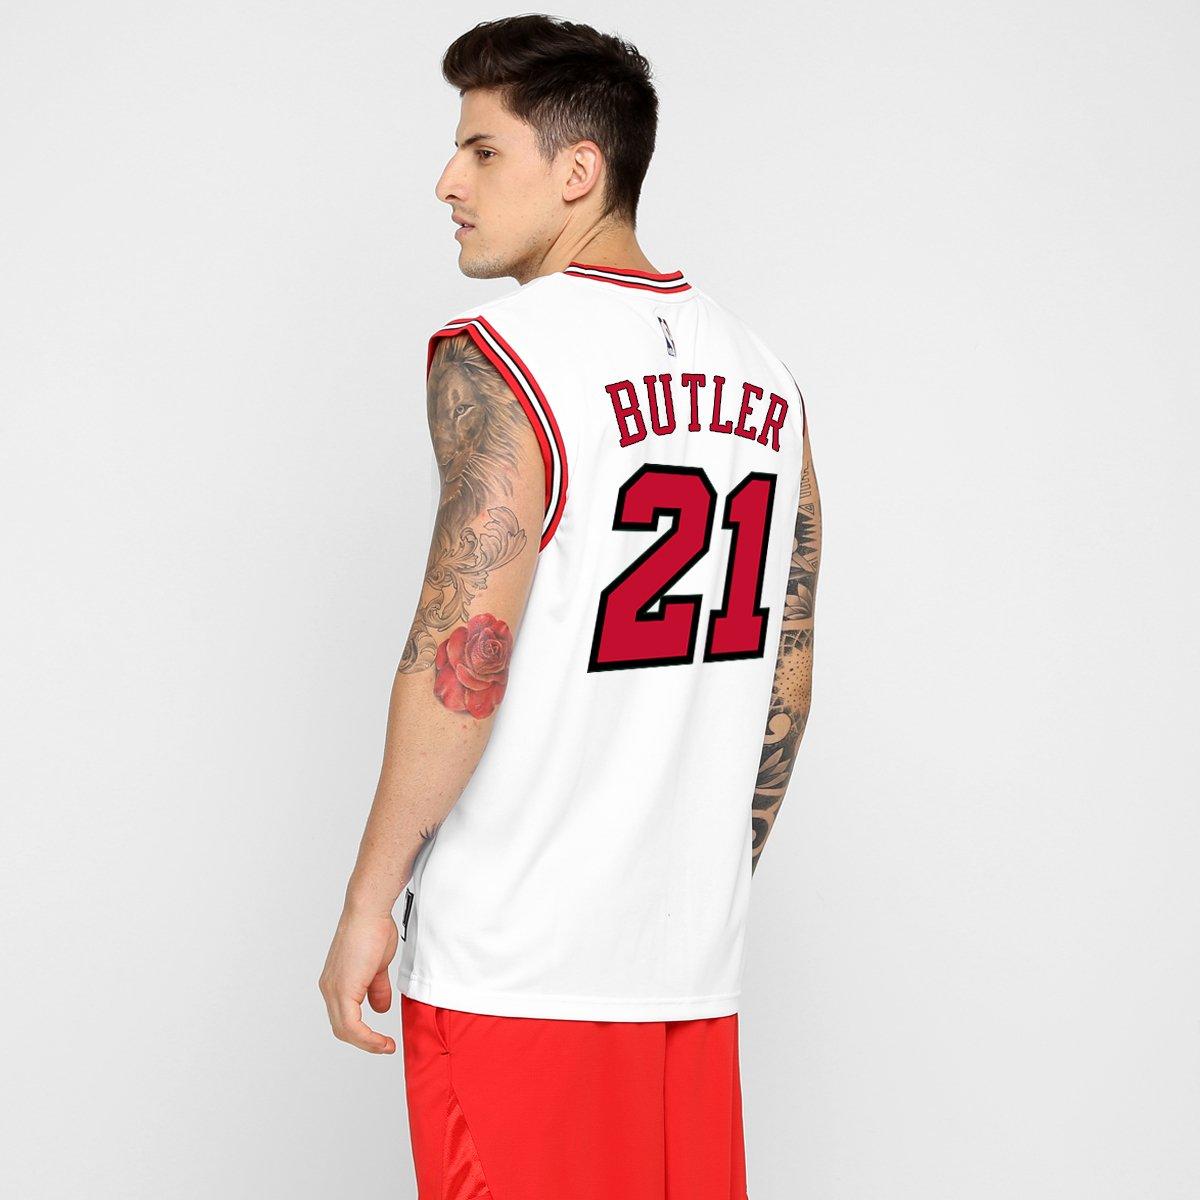 664b65c35 Camiseta Regata Adidas Chicago Bulls Home - Butler nº 21 - Compre Agora